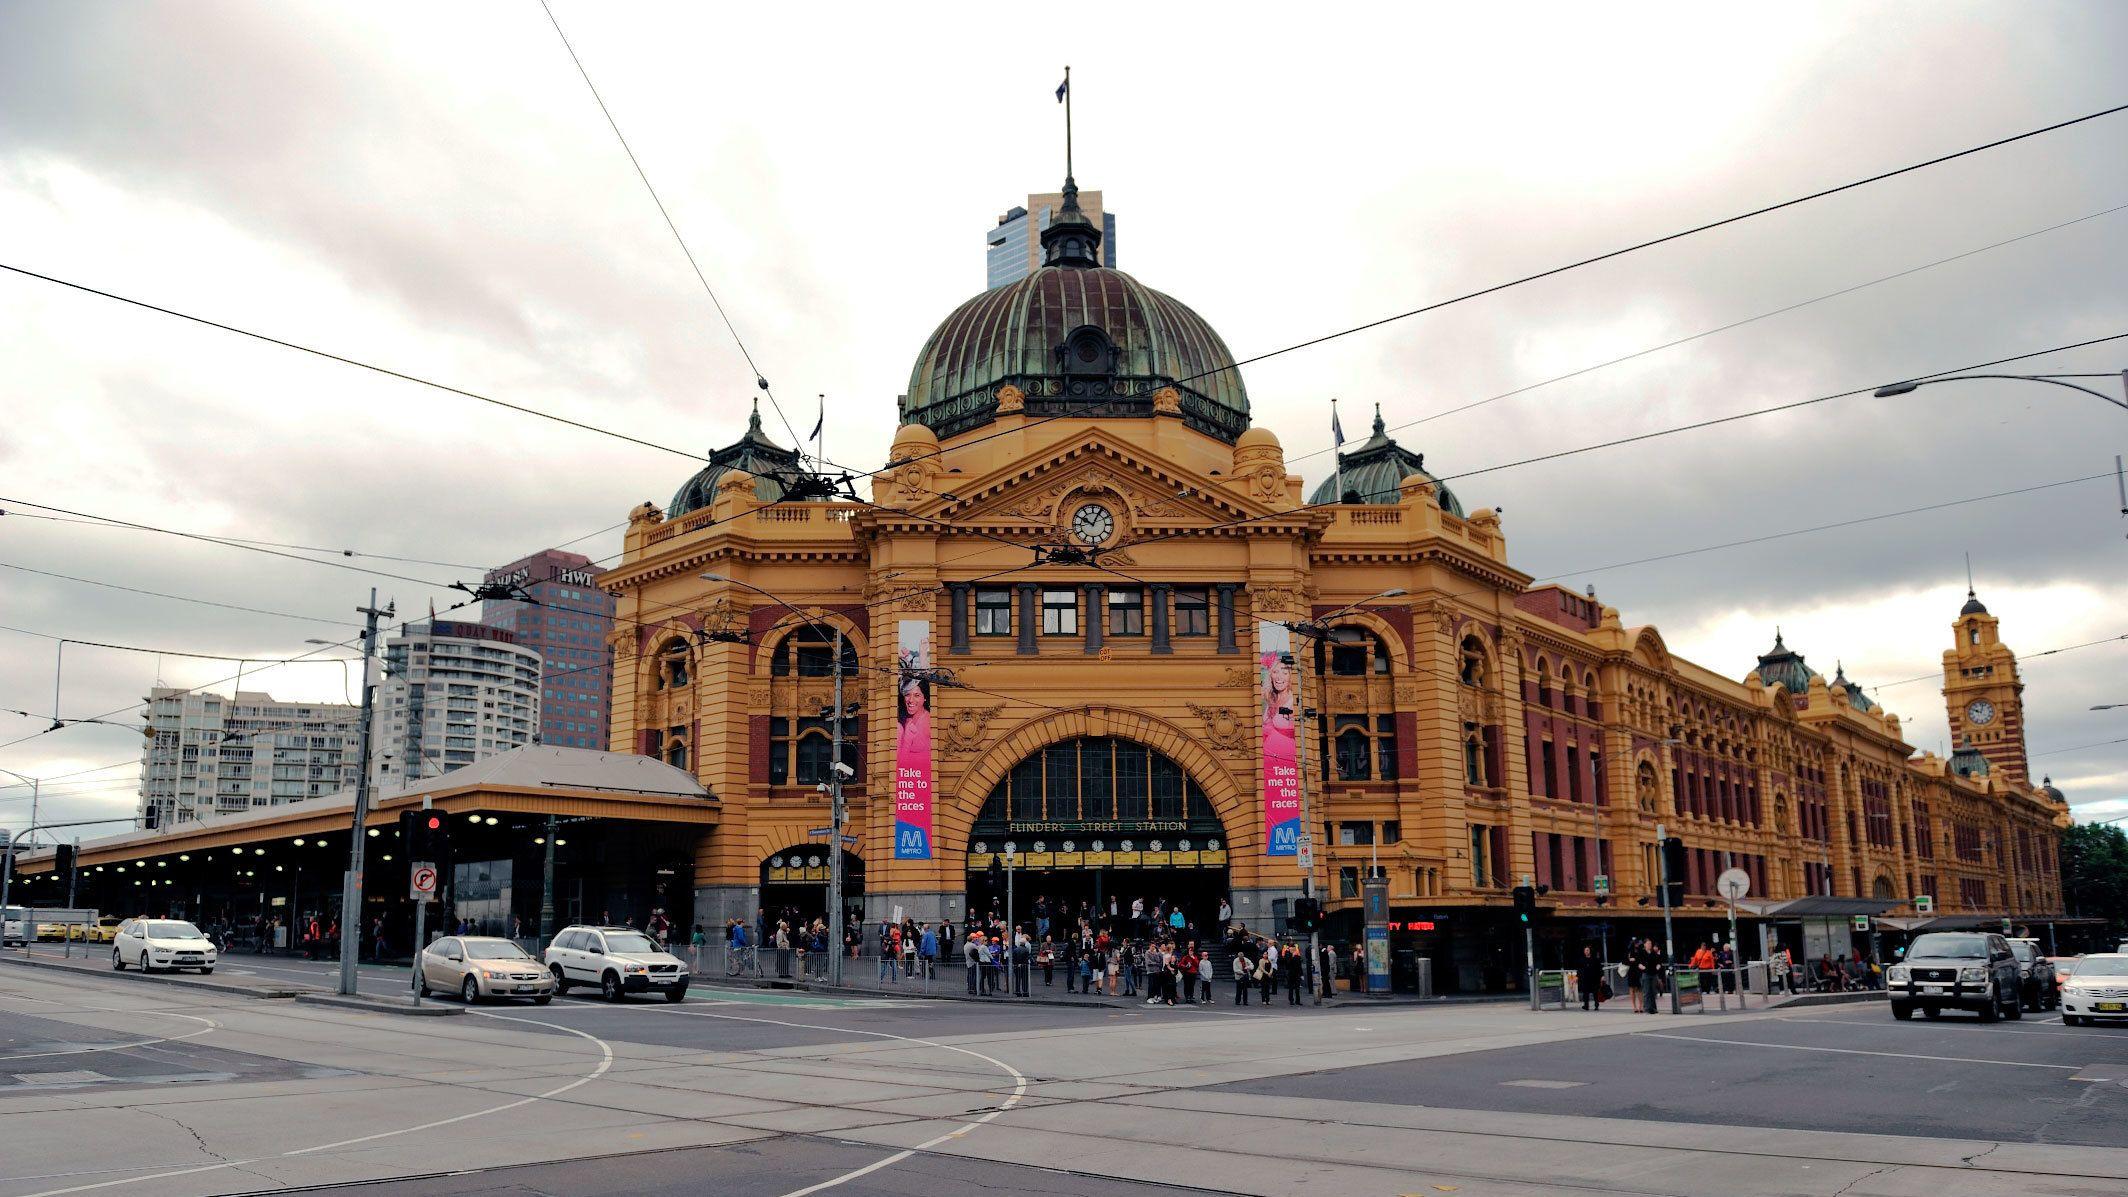 The Flinders Street Station in Melbourne